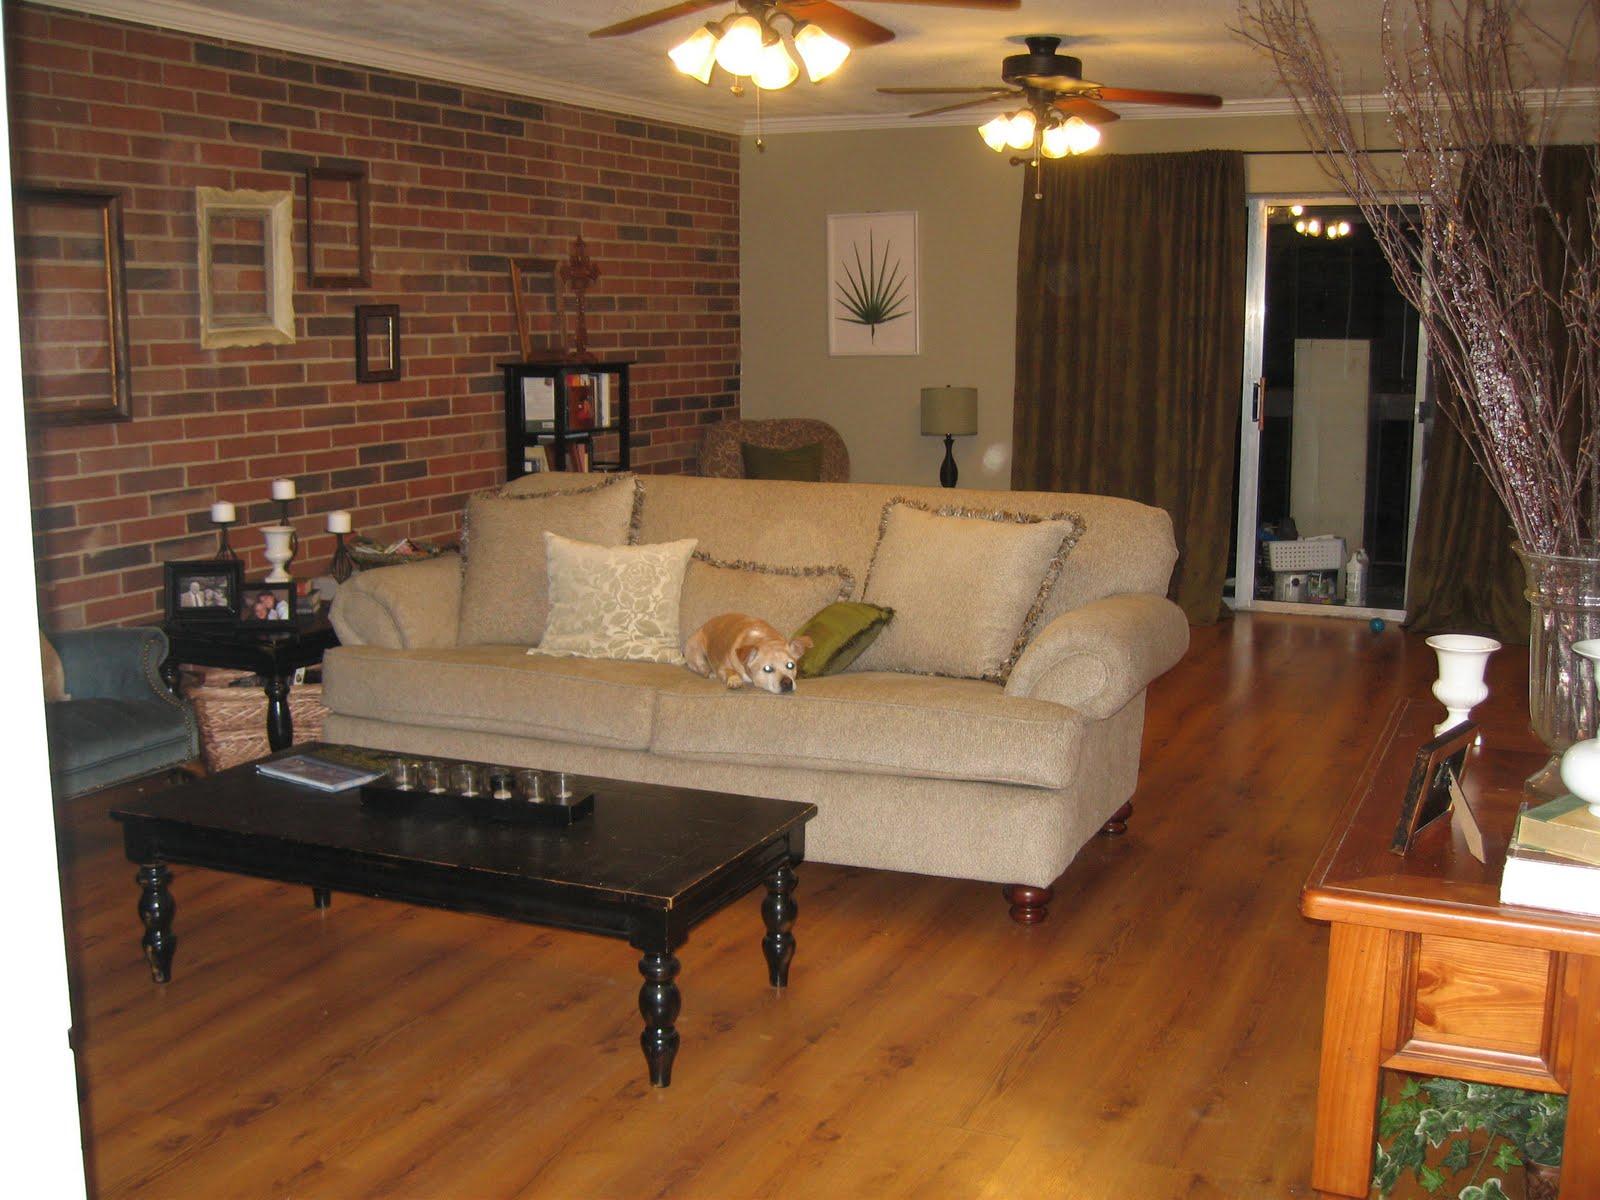 63 Brasilia Court - Livingroom With Brick Wall To Kitchen